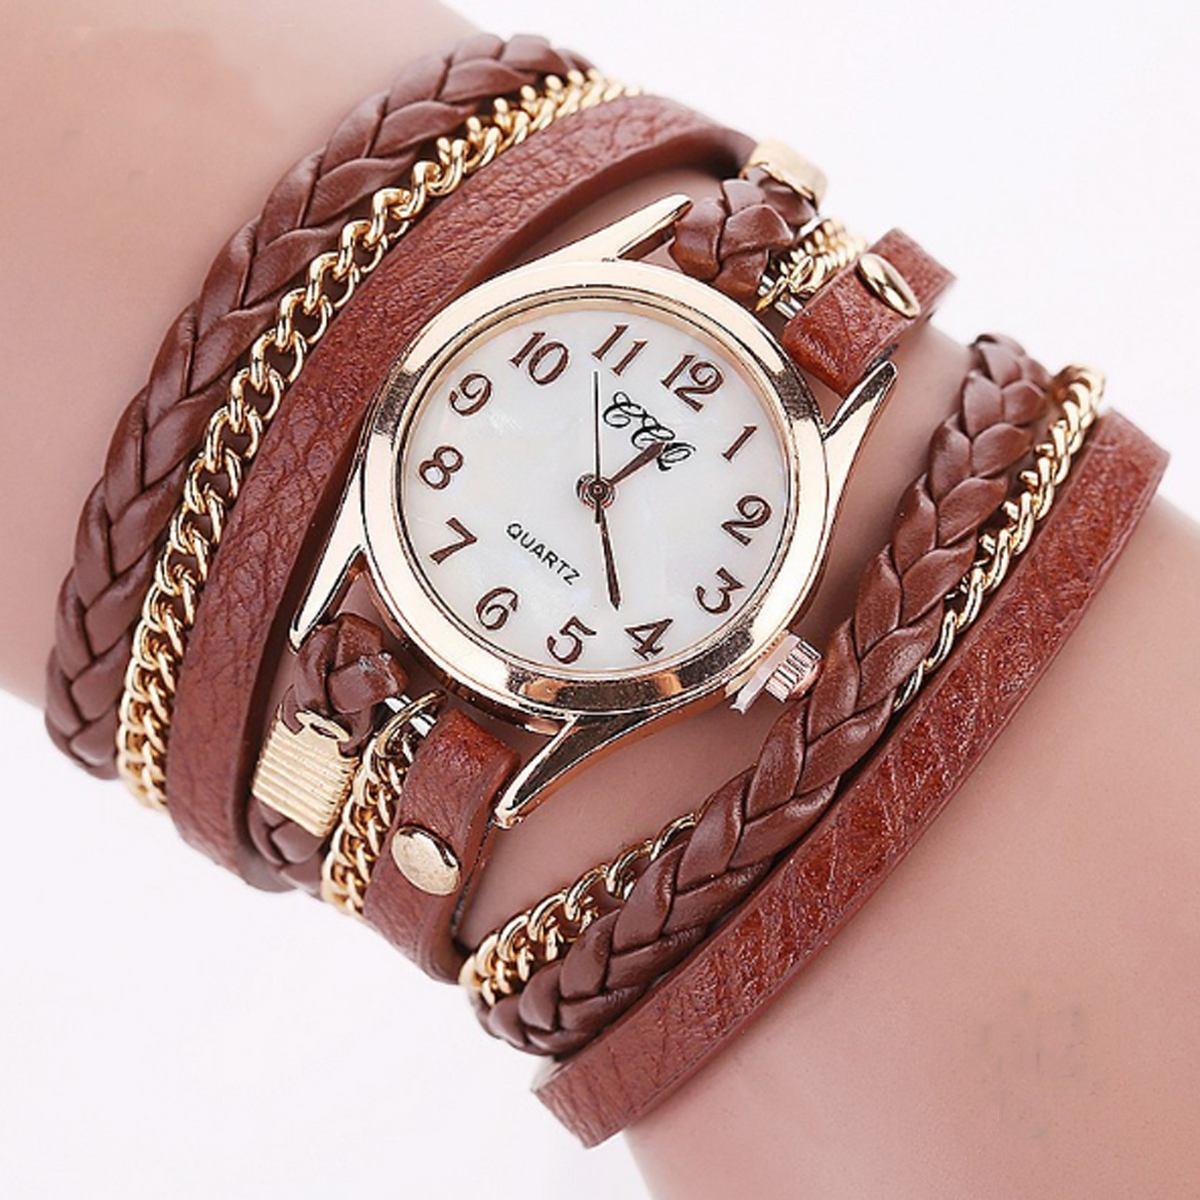 52f7c8e314e relógio feminino tipo bracelete bonito couro frete gratis. Carregando zoom.